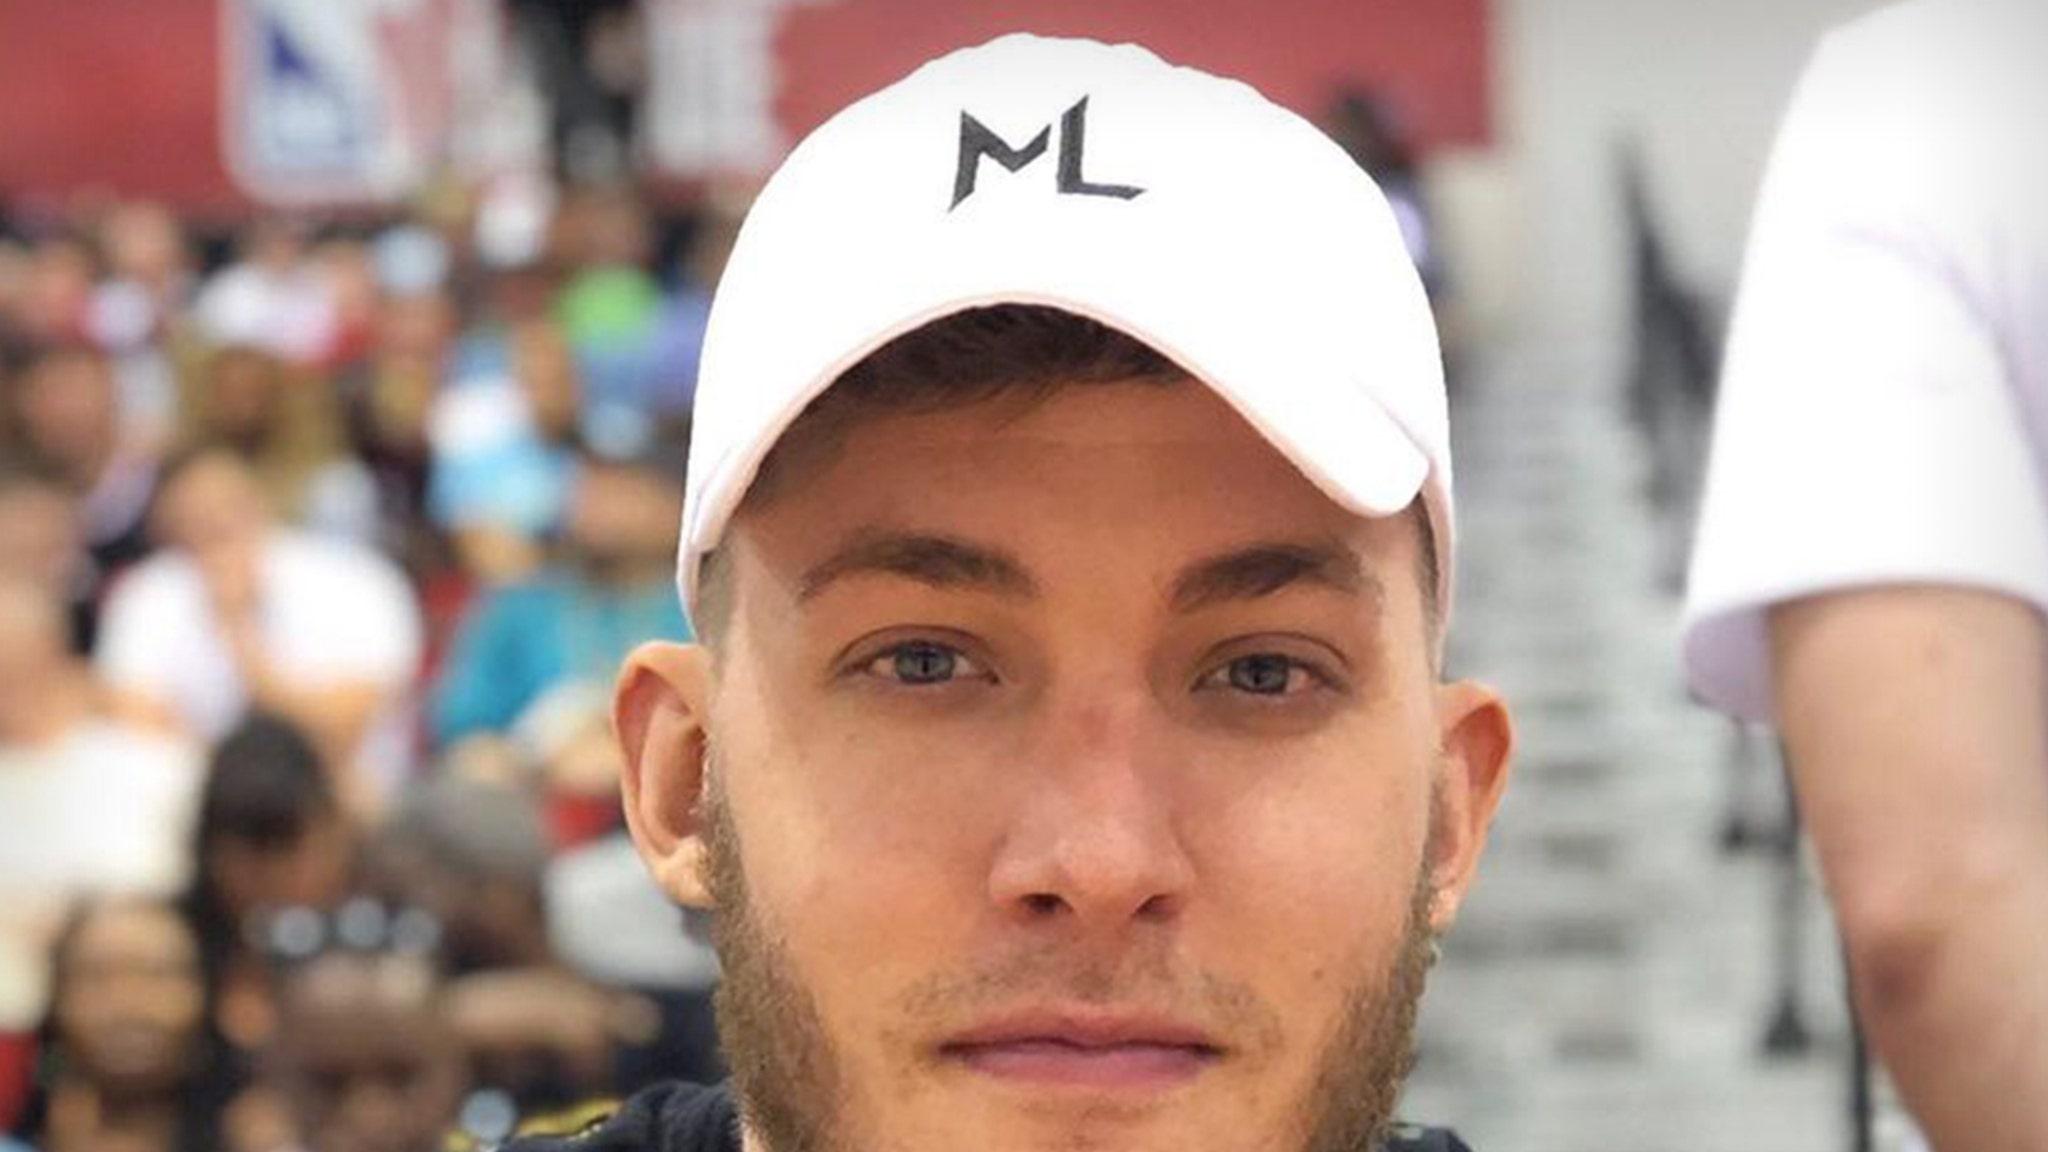 Meyers Leonard's Slur Addressed at 'Jew in the City' Protest of NBC - TMZ